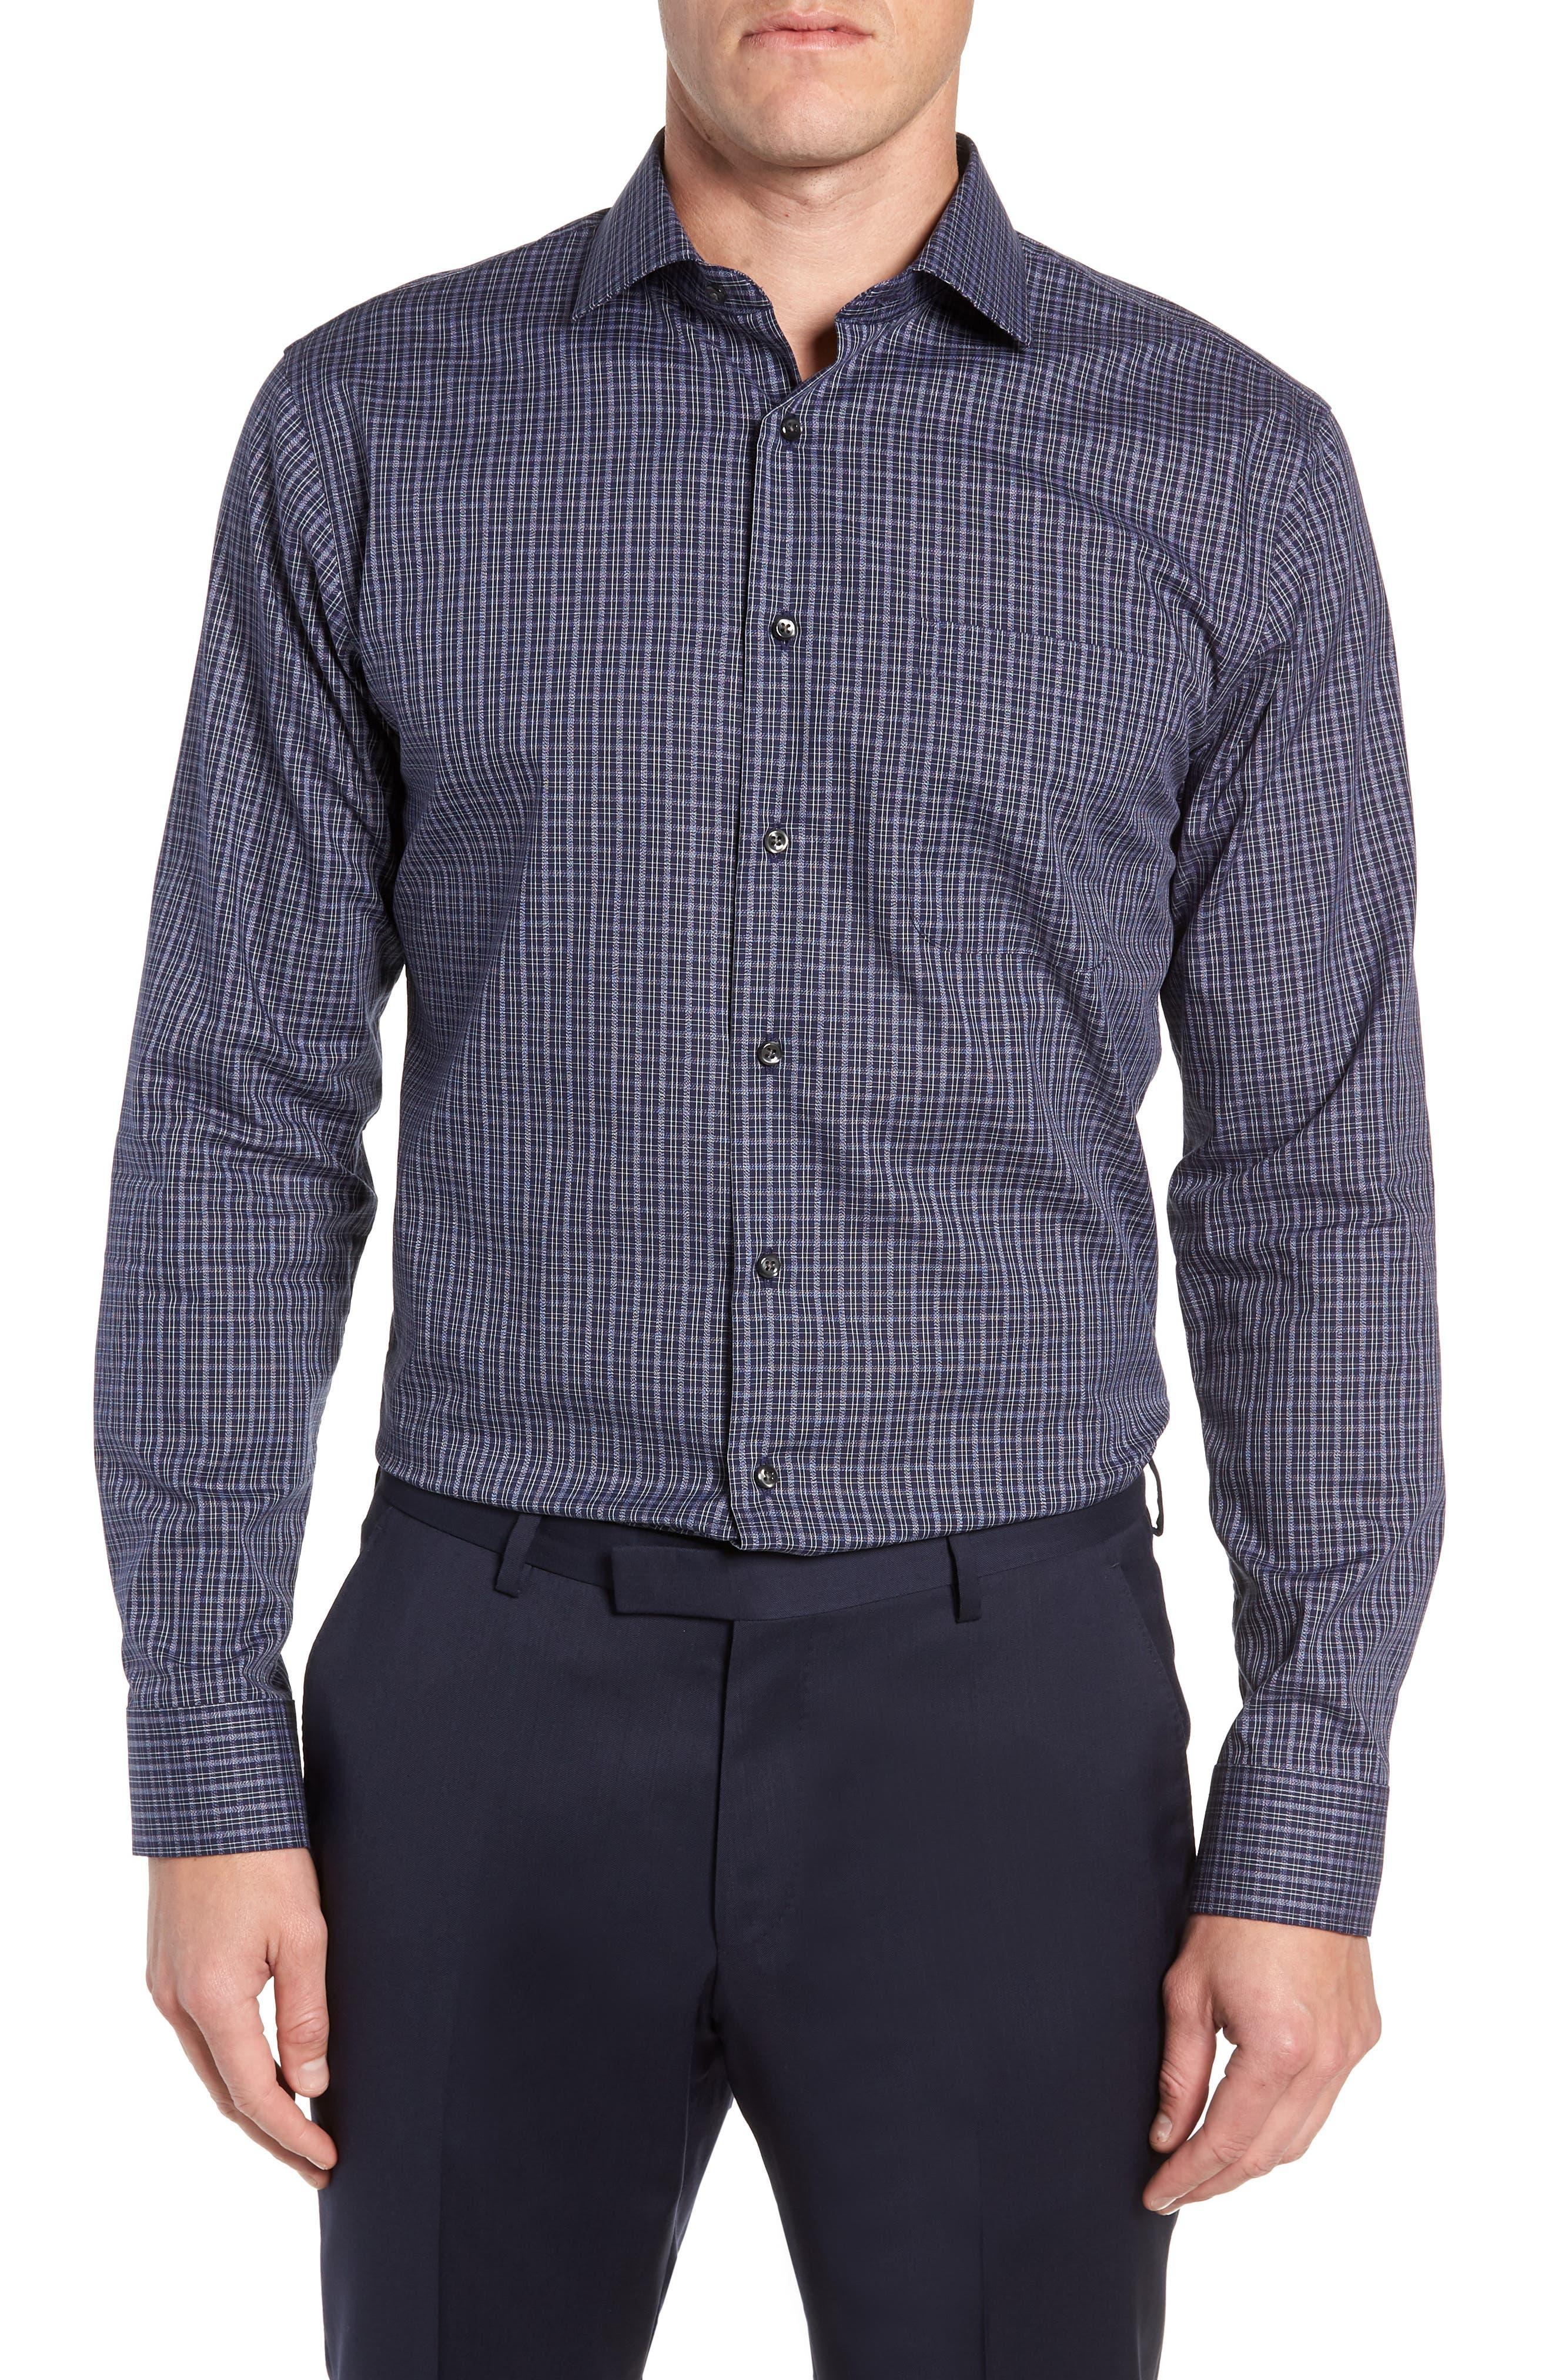 Trim Fit Non-Iron Plaid Dress Shirt,                             Main thumbnail 1, color,                             NAVY NIGHT